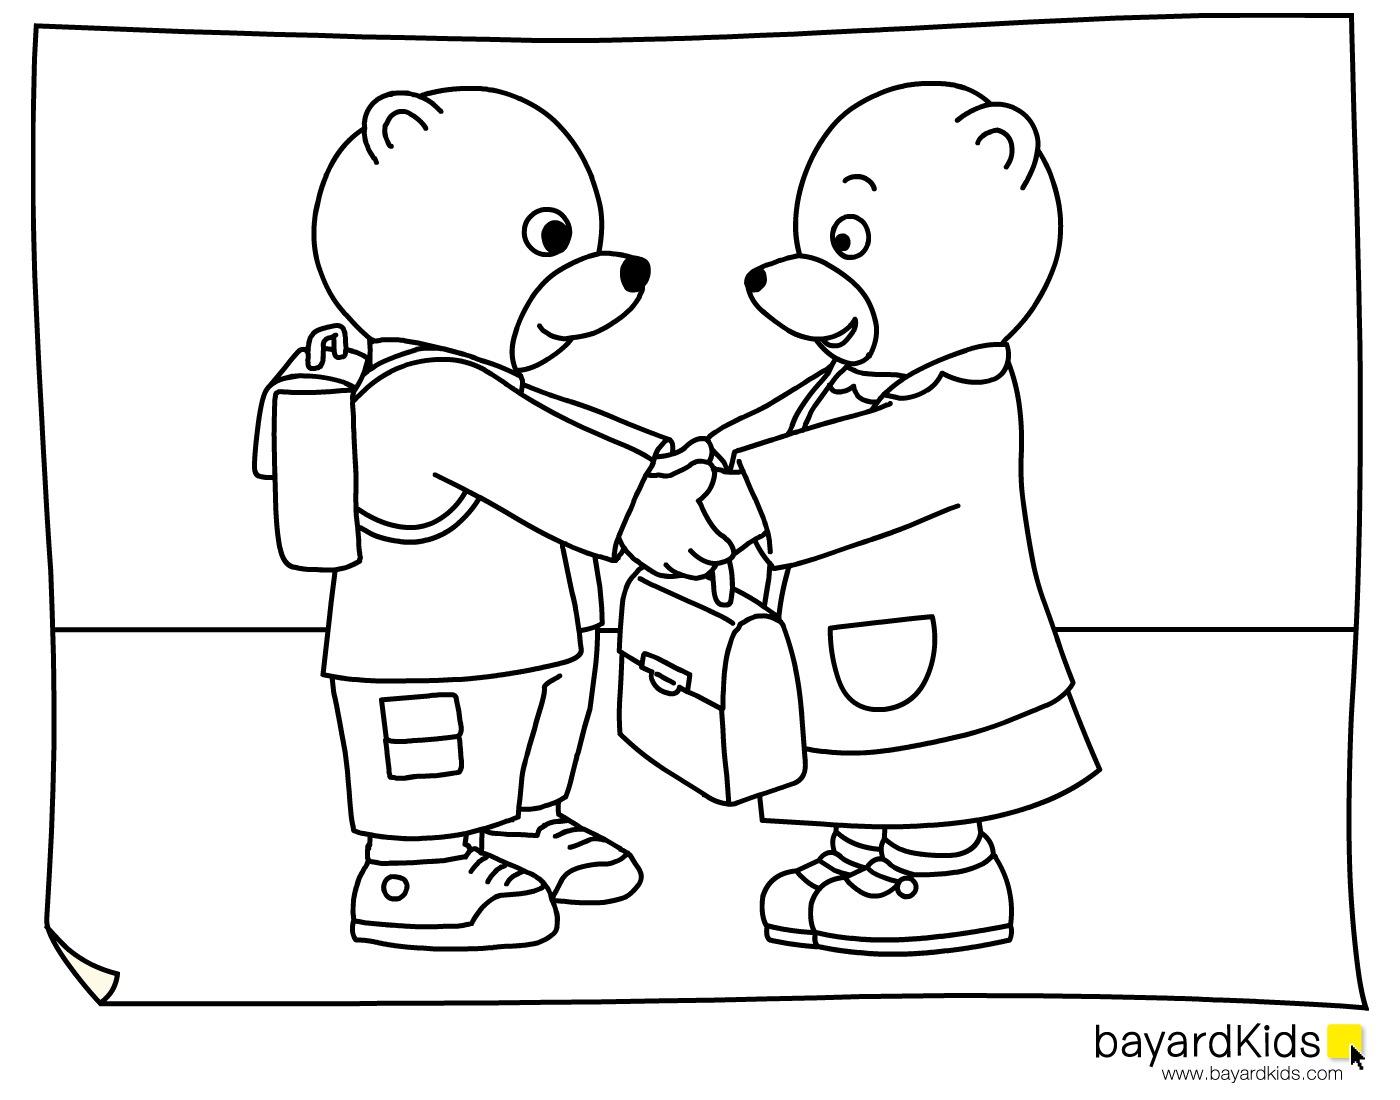 Coloriage dessiner petit ours brun s habille - Ours a dessiner ...